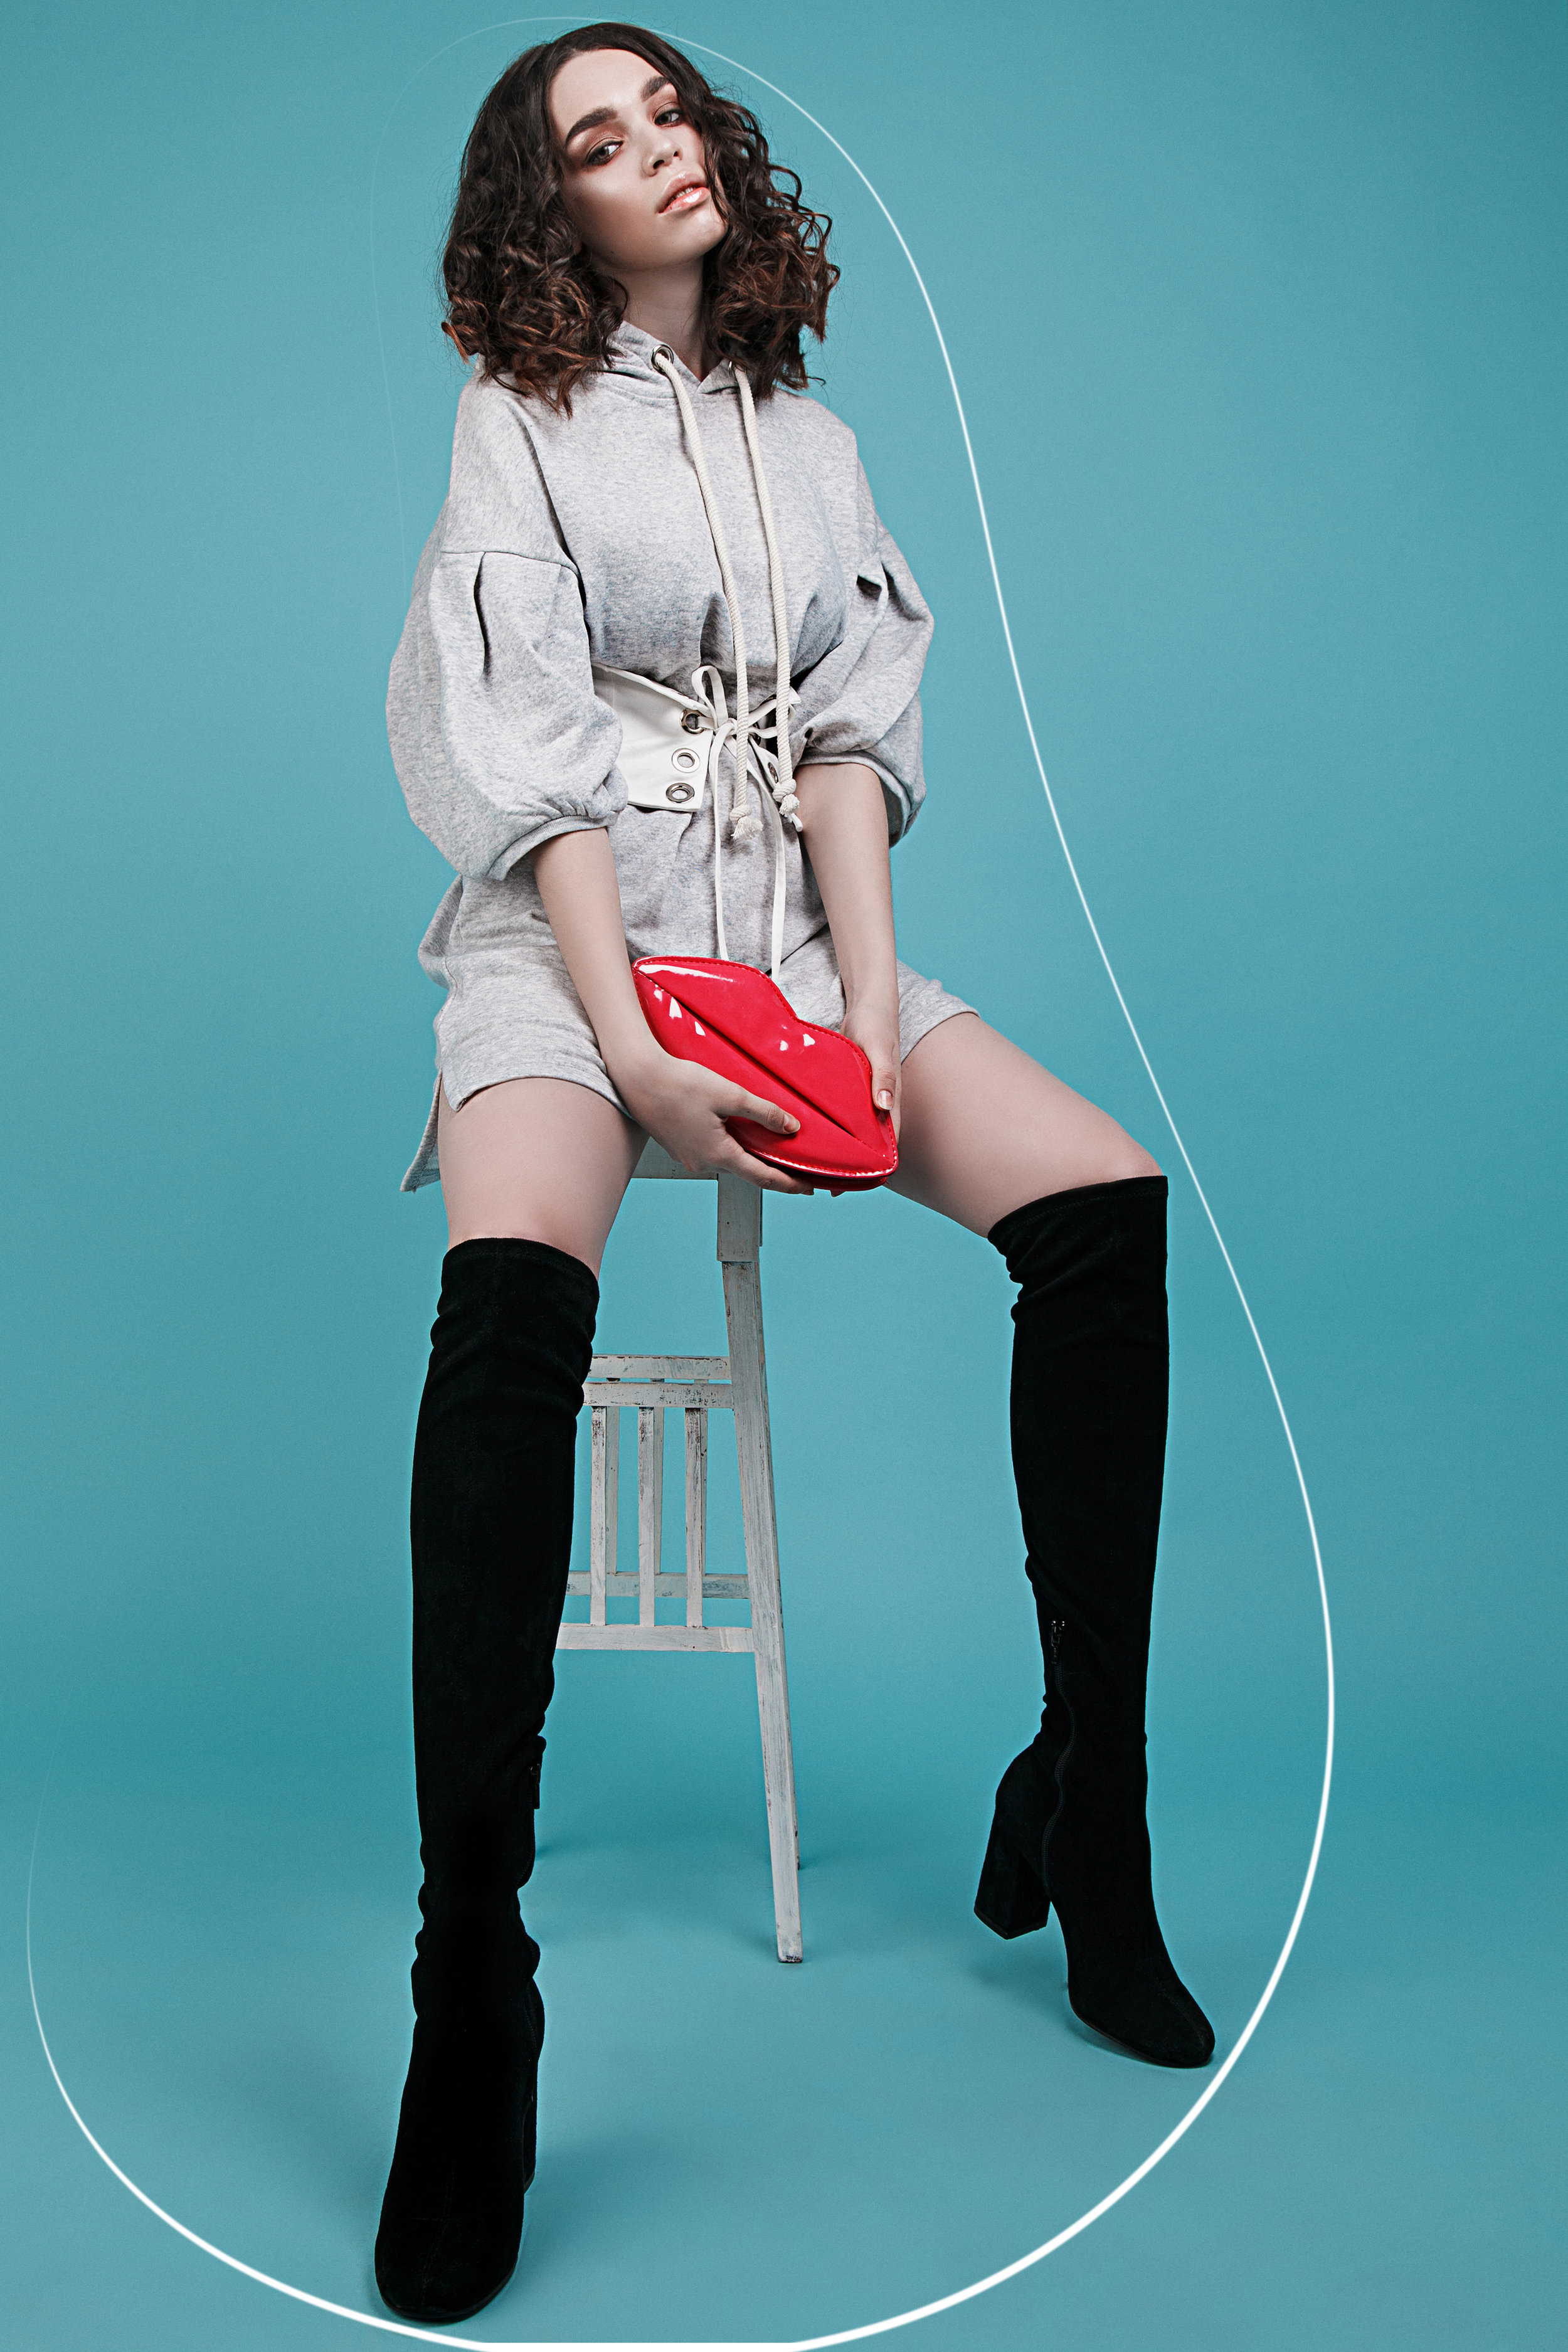 Sweatshirt Bershka, Corset-belt Zara, Boots Zara, bag Lady Collection